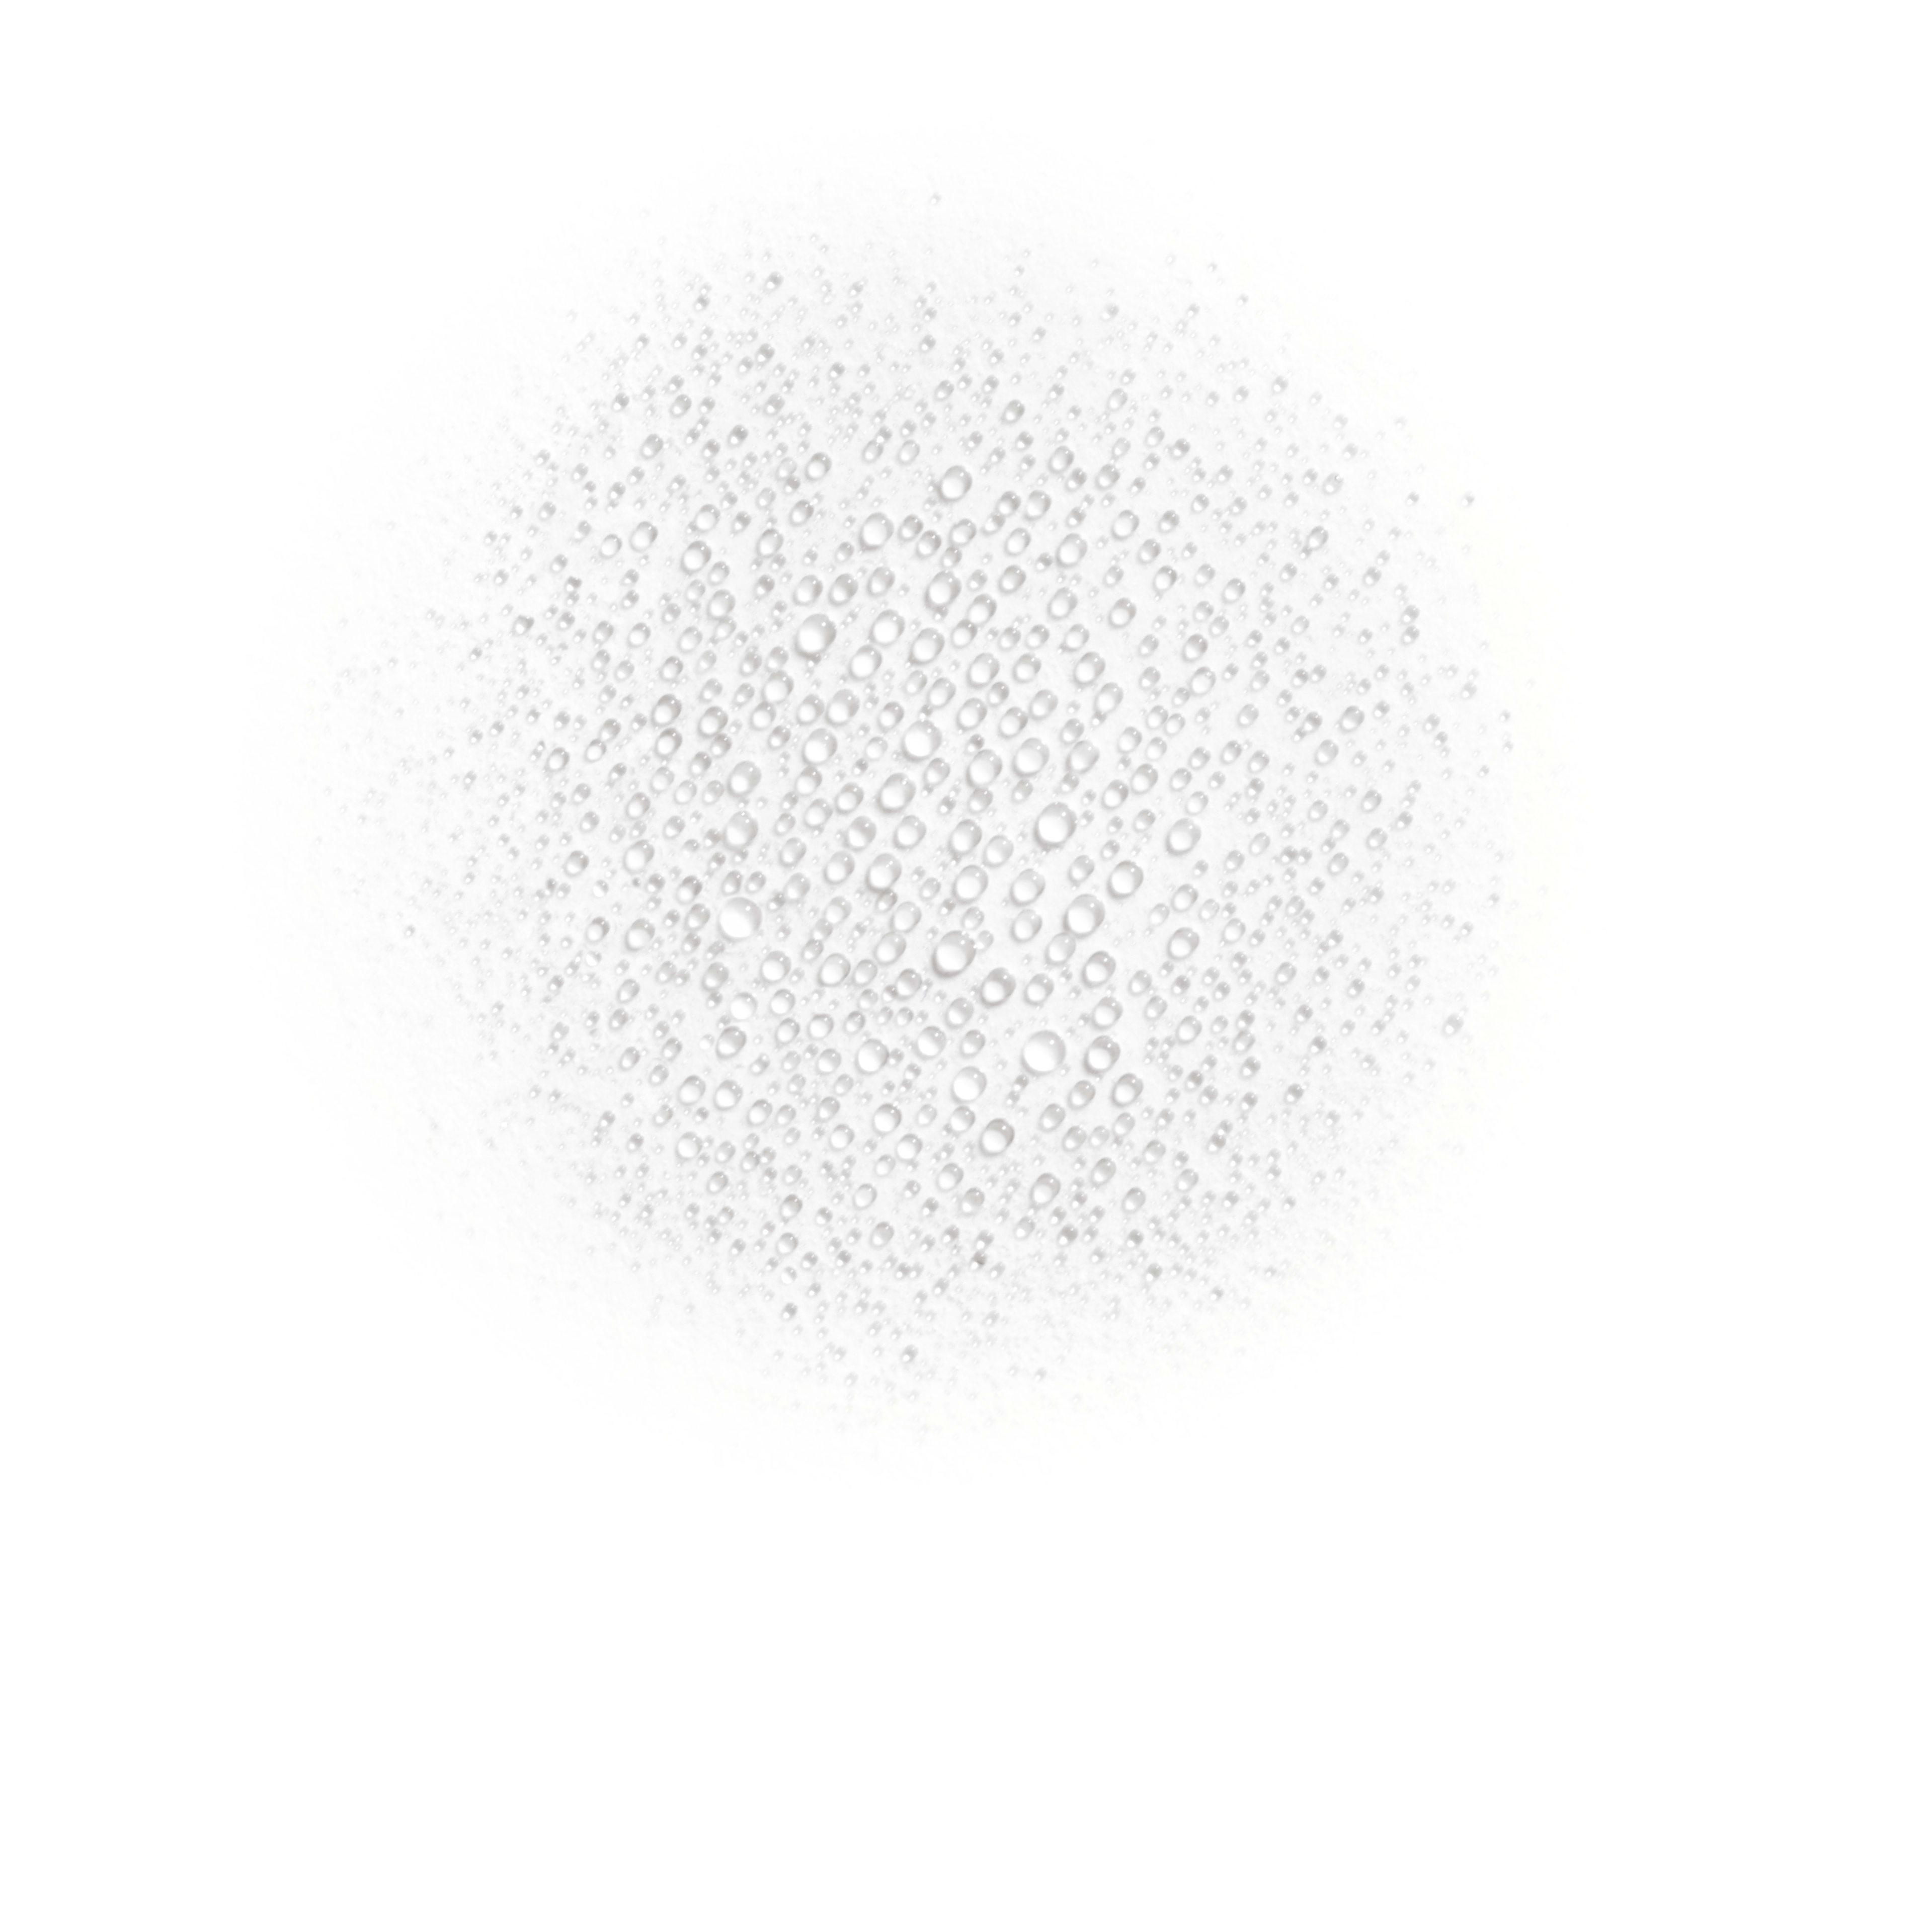 HYDRA BEAUTY ESSENCE MIST - skincare - 1.7OZ. - Basic texture view